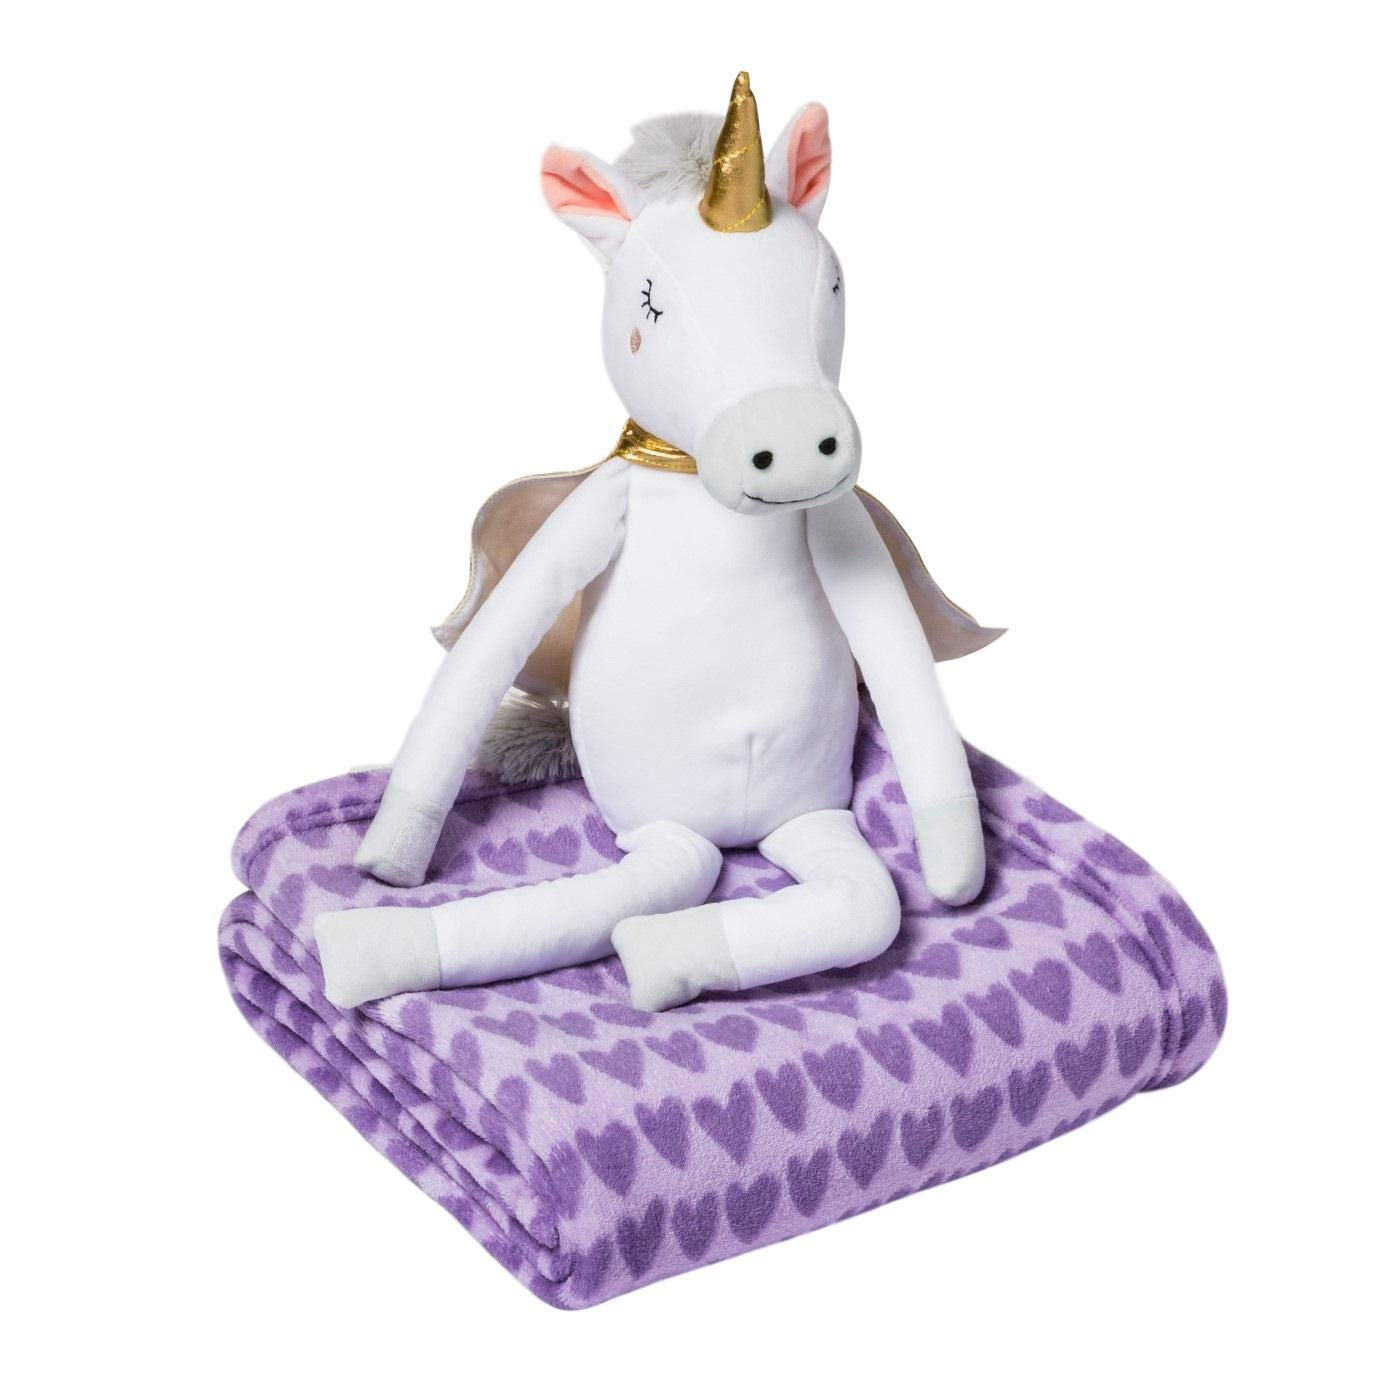 by pillowfort Unicorn Throw Blanket Hugger for Girls Plush Animal Soft Warm 2 Pc Set